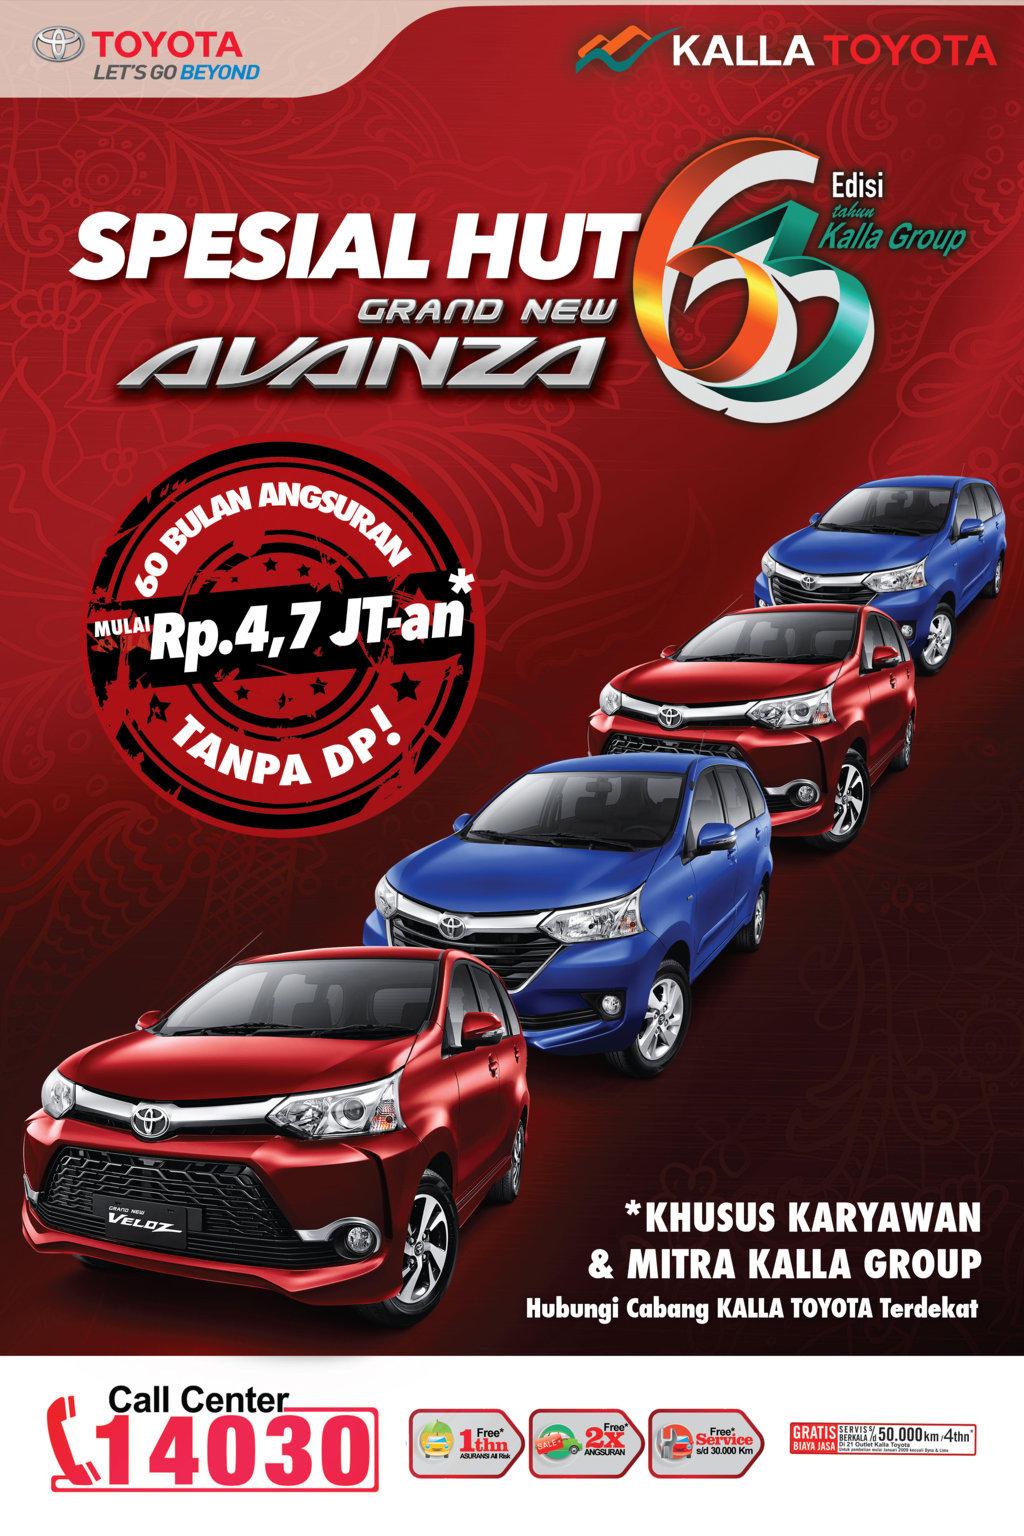 Harga Grand New Avanza Makassar Agya Trd Merah Pt Hadji Kalla Toyota 2016 Info Promo Diskon Kredit Ulang Tahun 2015